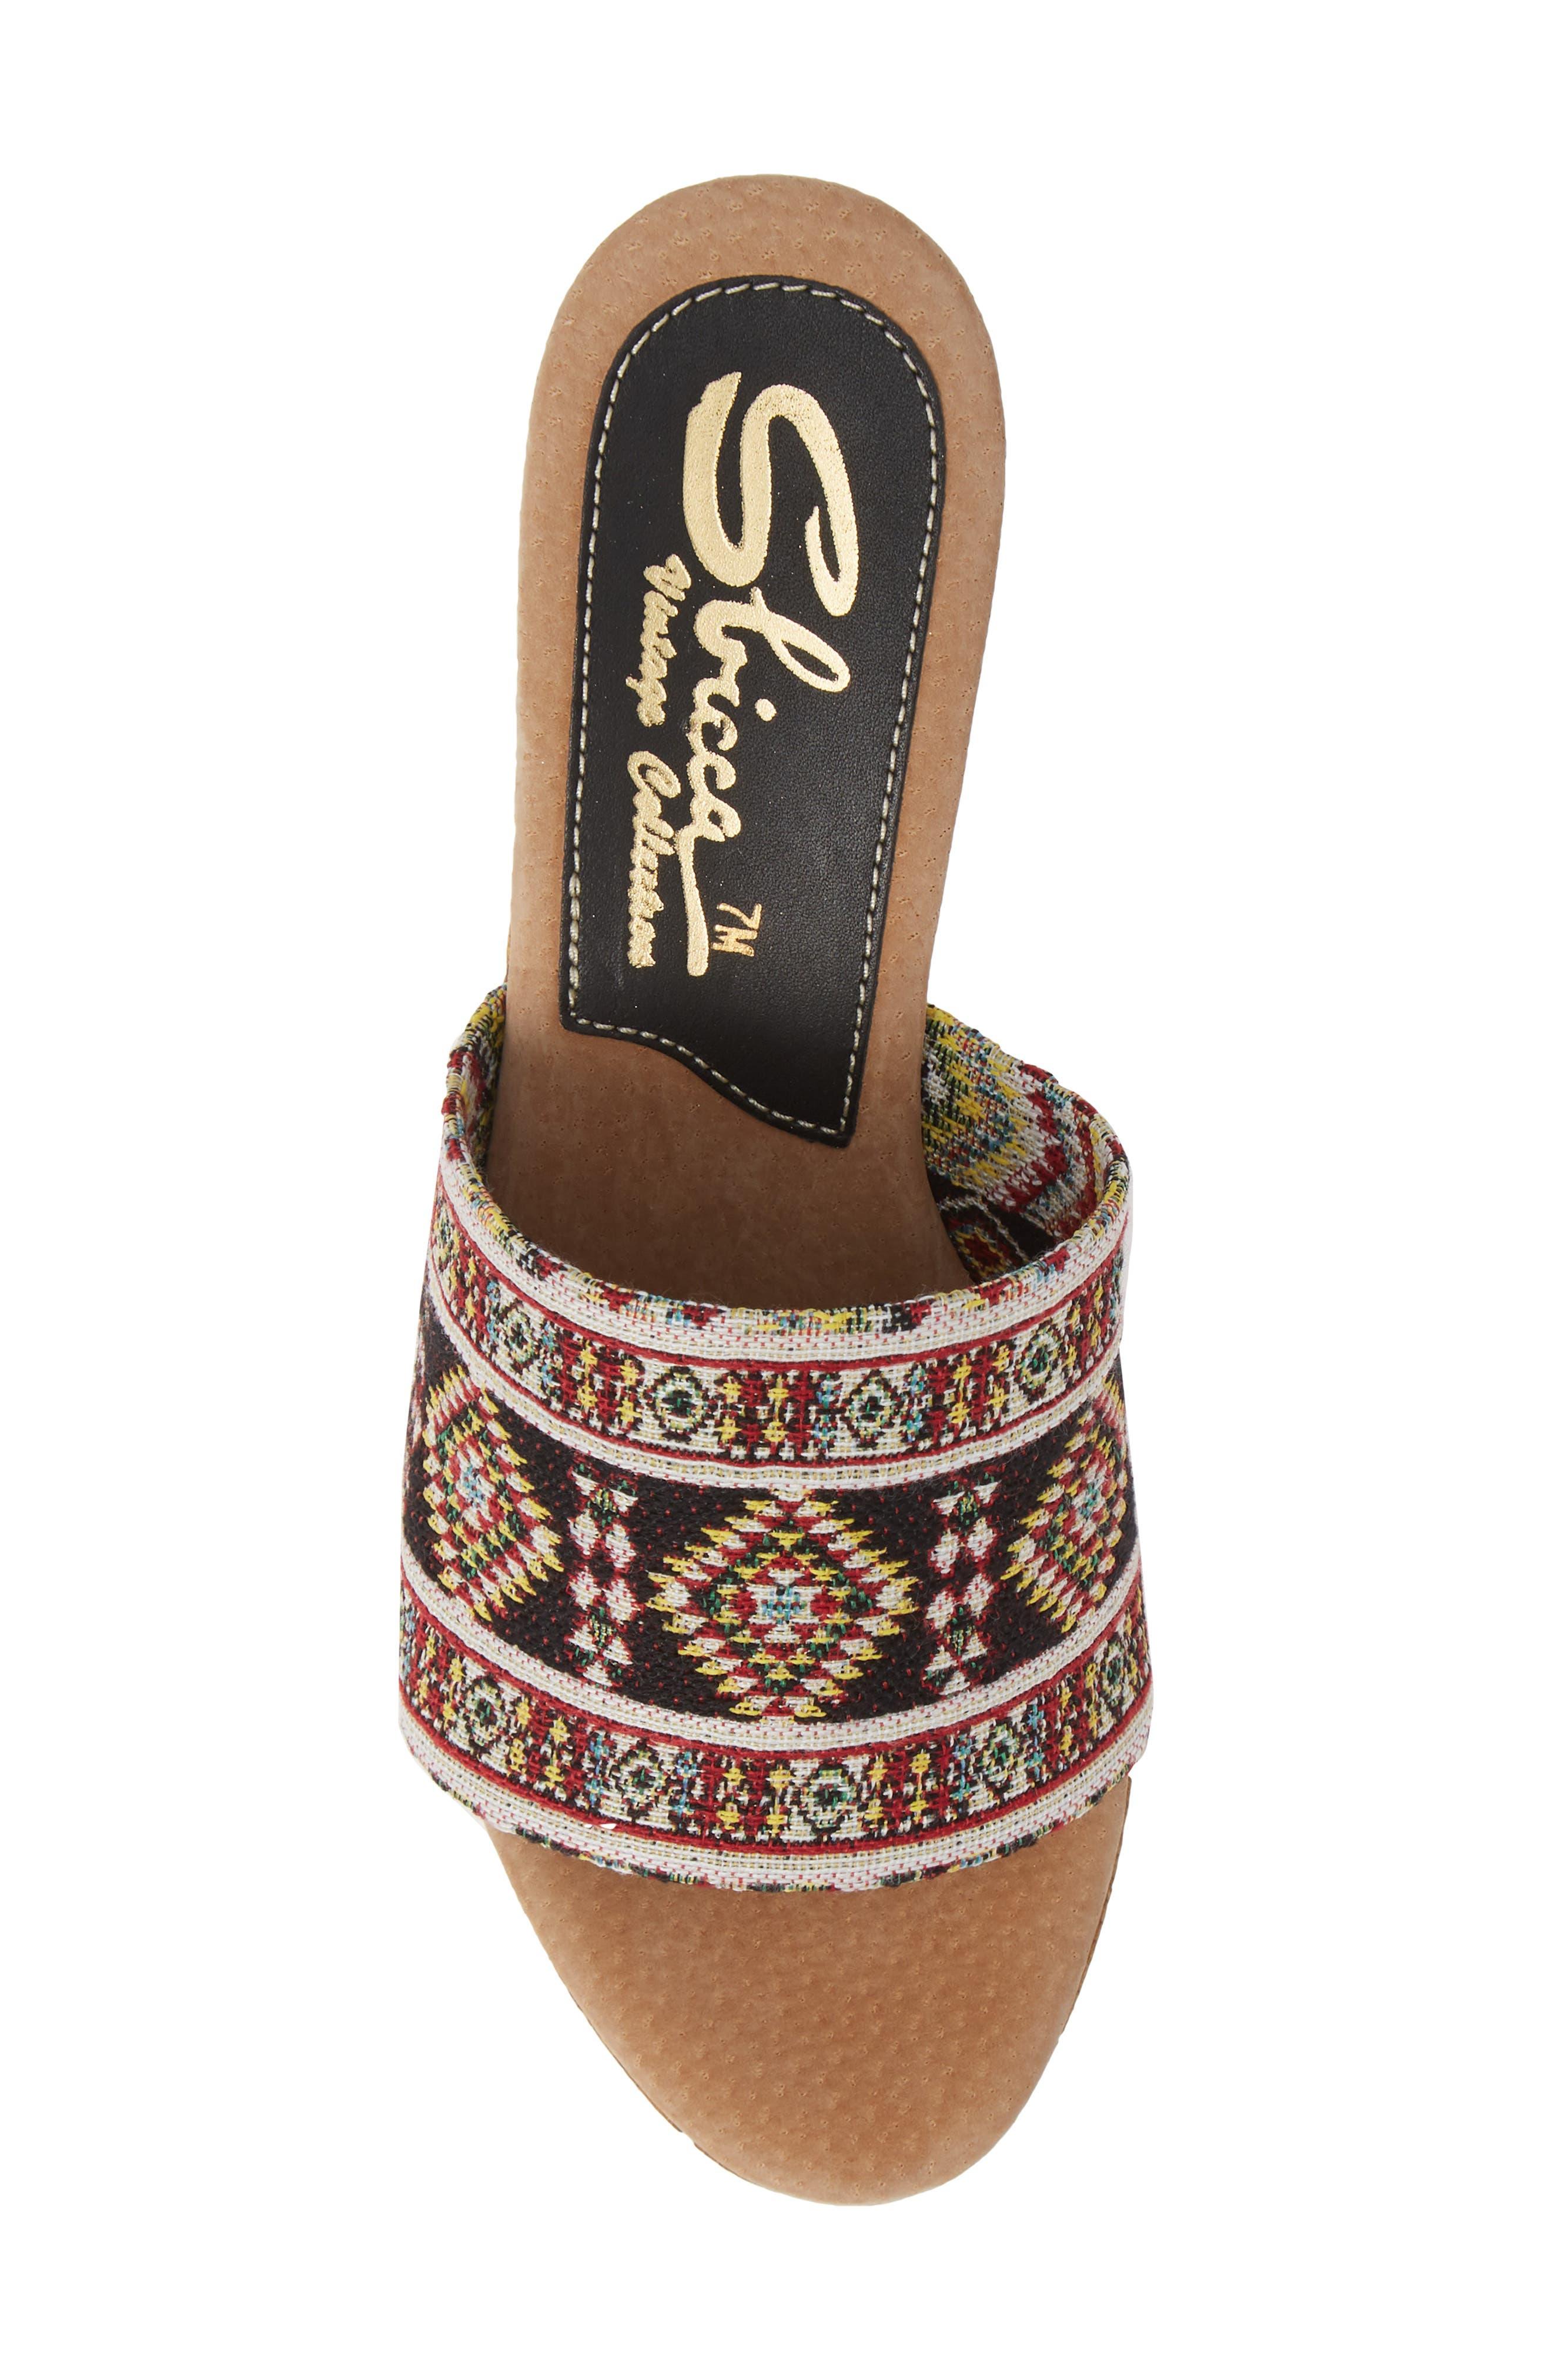 Orabela Platform Wedge Sandal,                             Alternate thumbnail 5, color,                             BLACK MULTICOLOR FABRIC